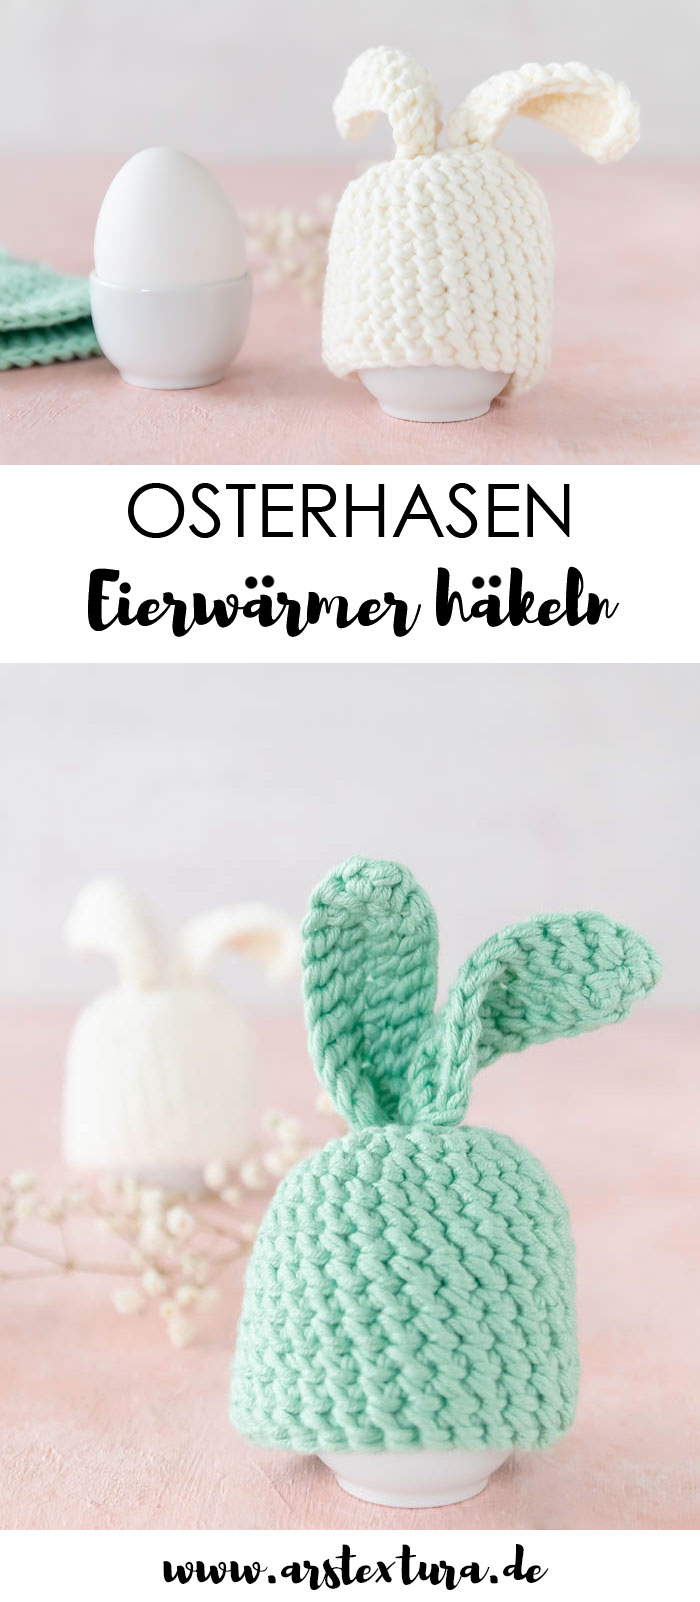 Ostern Dekoration: Osterhasen Eierwärmer häkeln